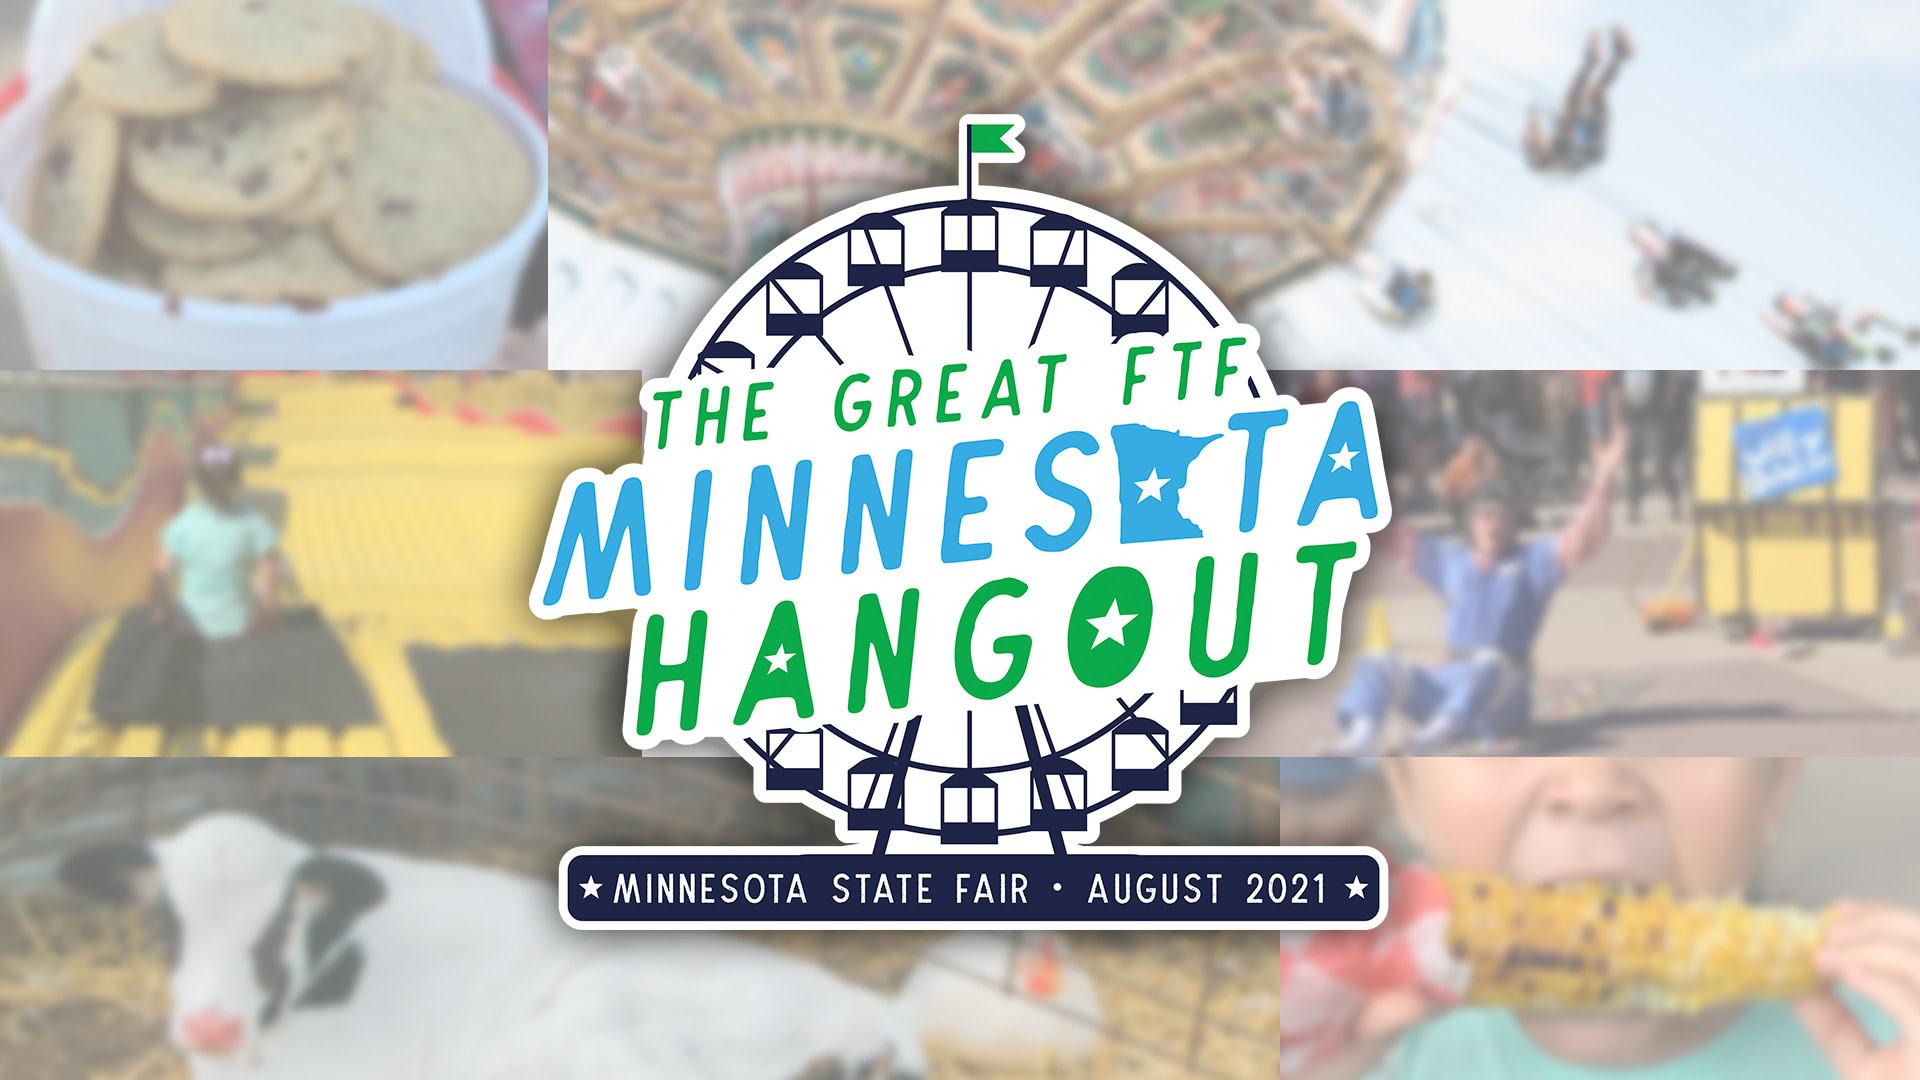 Fulltime Families Minnesota Hangout